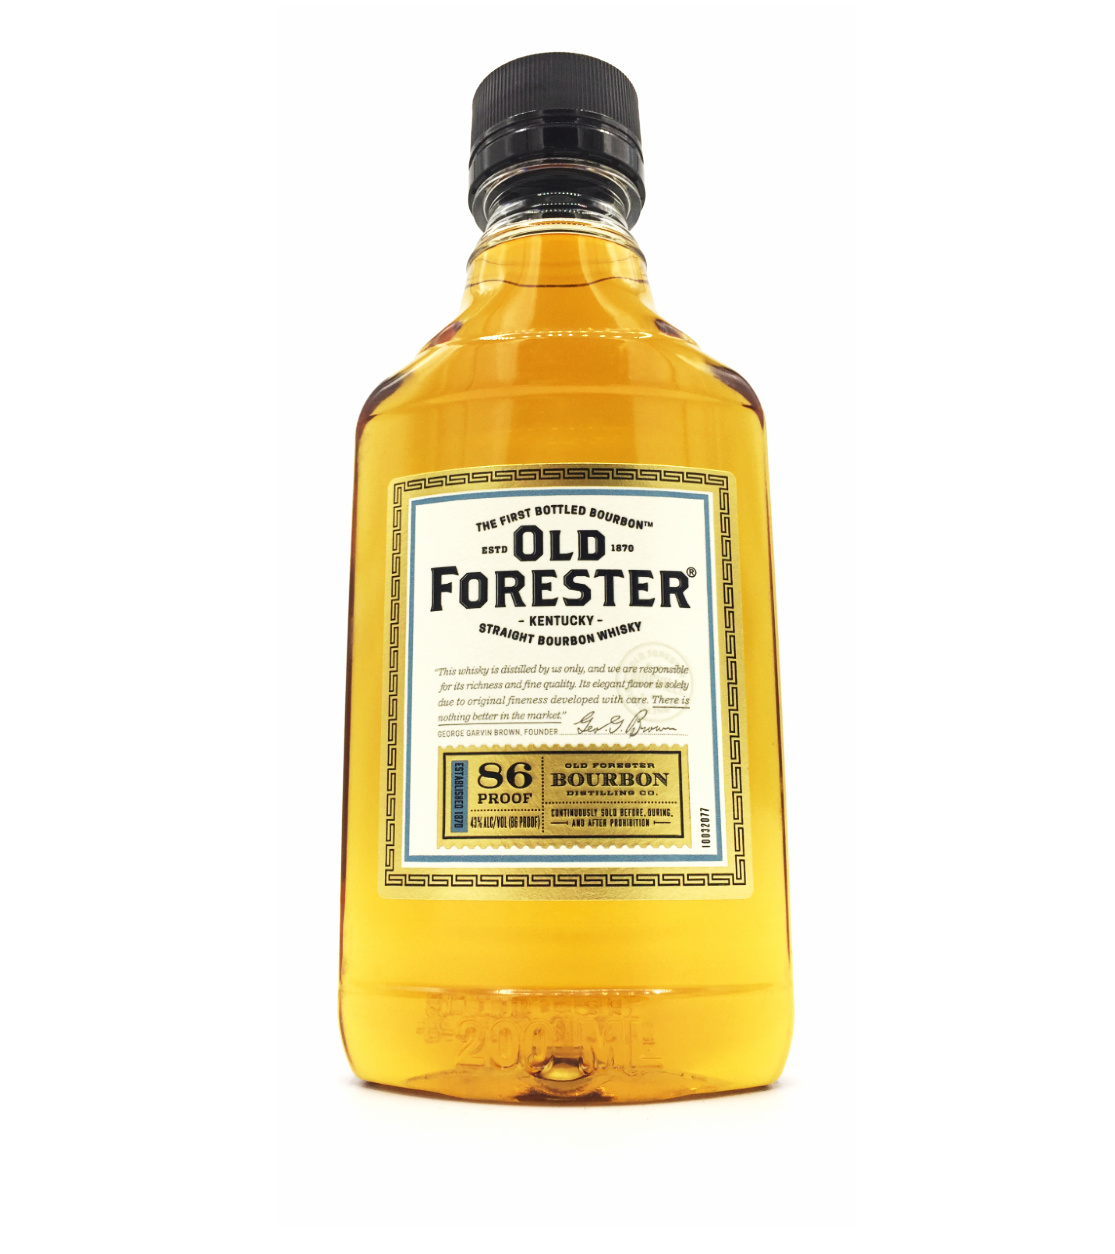 Old Forester Kentucky Straight Bourbon Whiskey 200ml